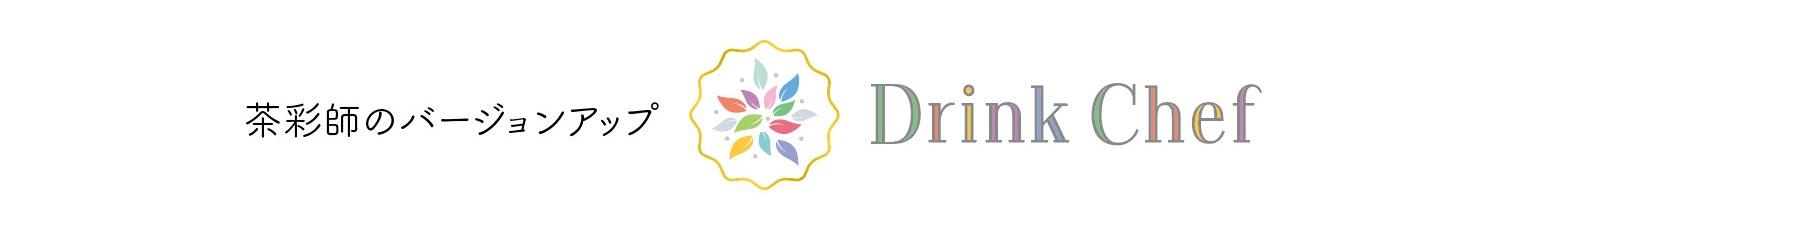 Drink Dhef